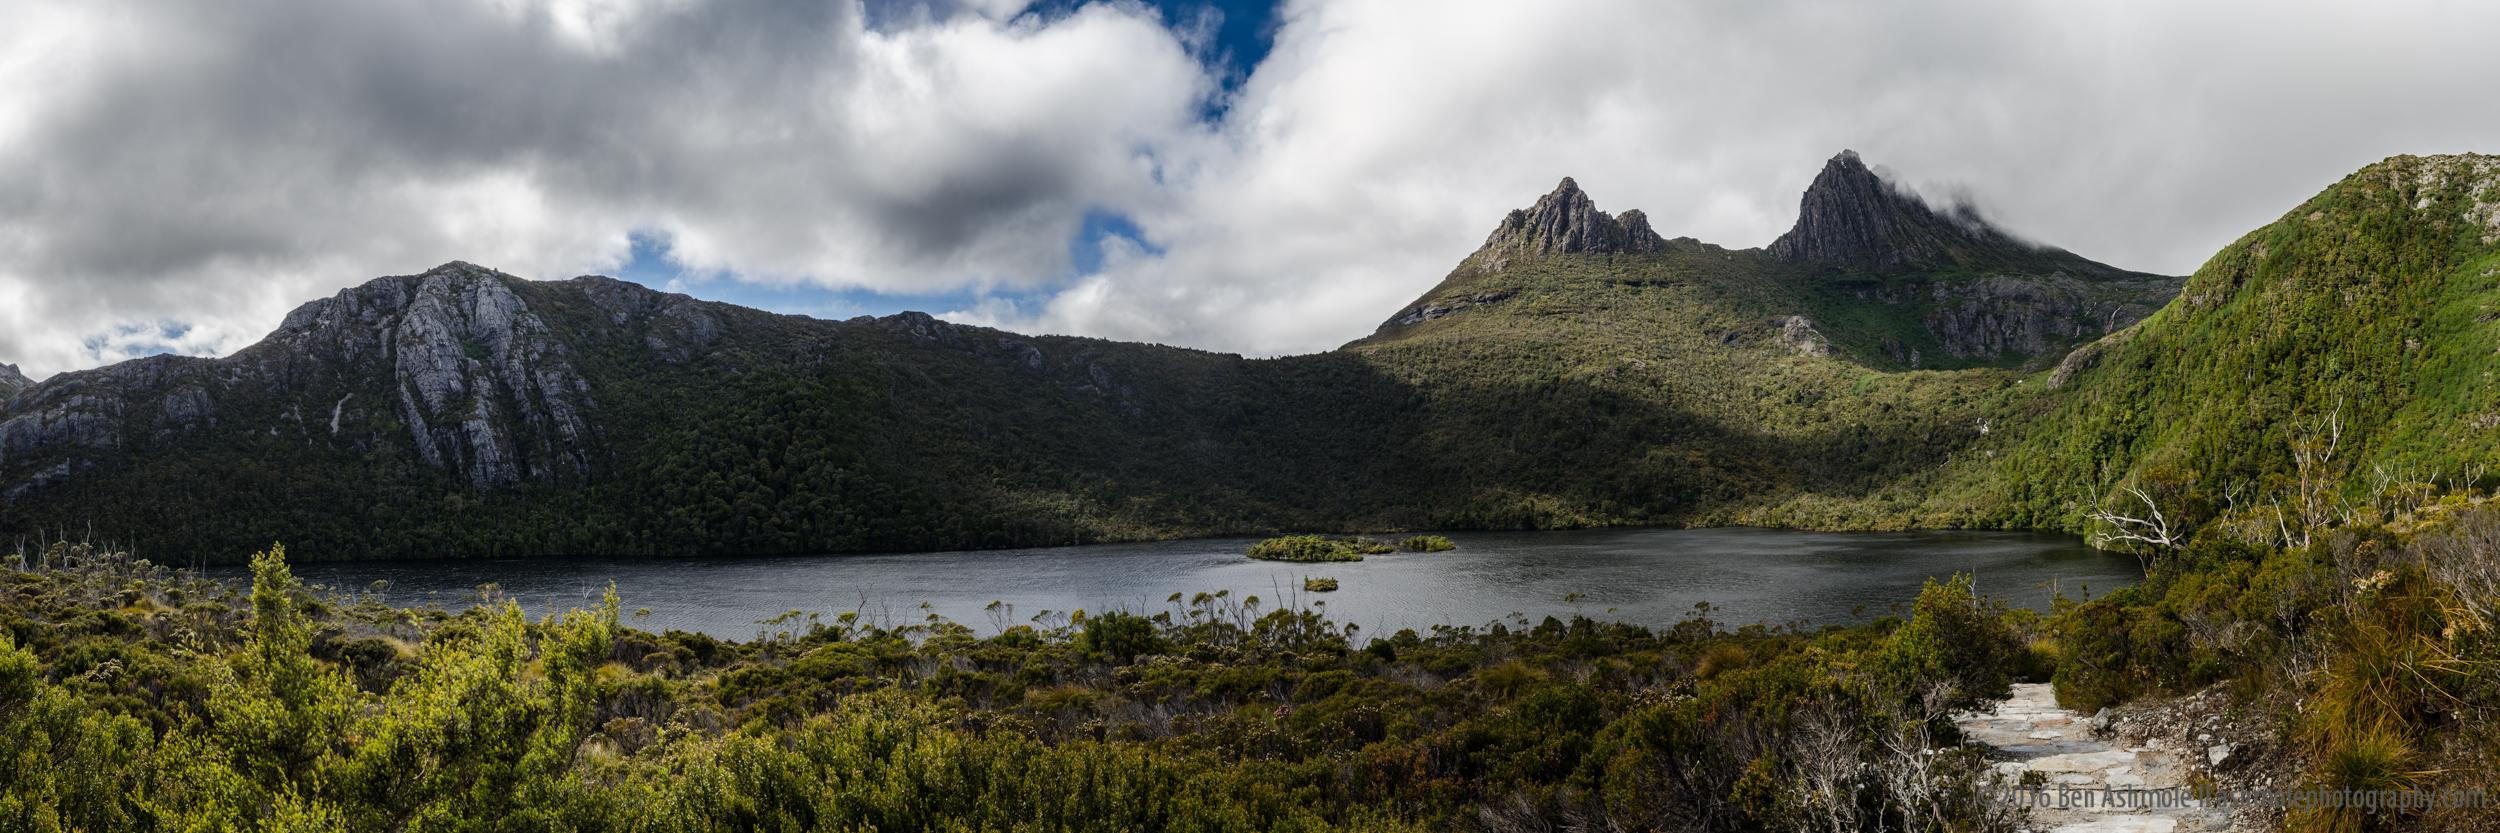 Cradle Mountain Panorama, Tasmania, Australia